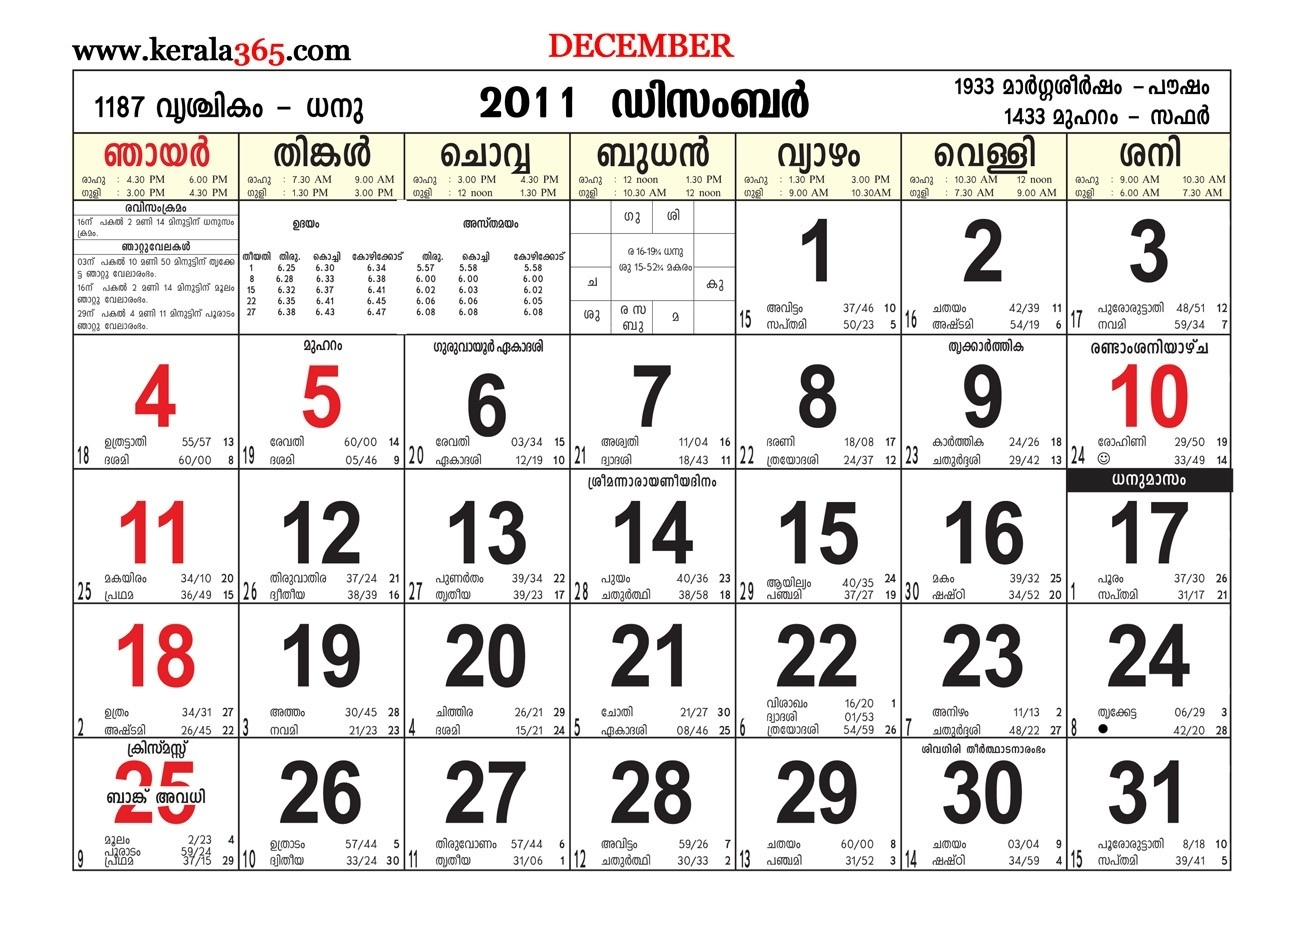 Malayalam Calender December 2011 Kerala365 On Calendar | Thekpark with regard to Malayalam Calender Of This Month